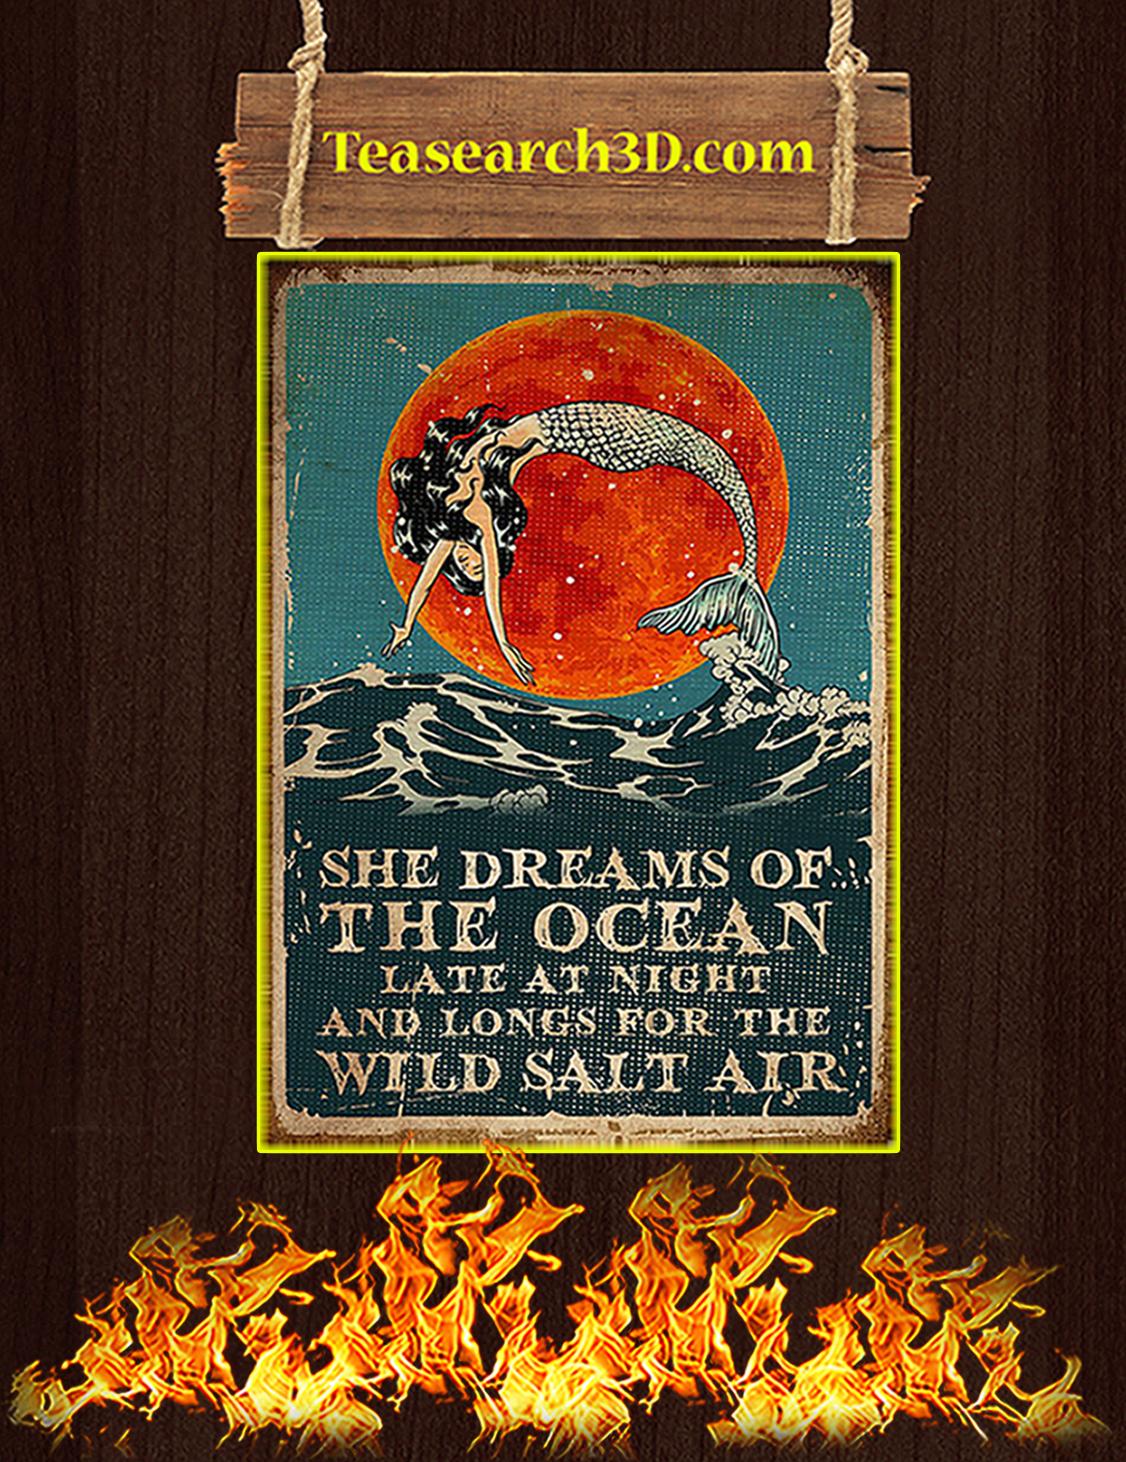 Mermaid she dreams of the ocean poster A3